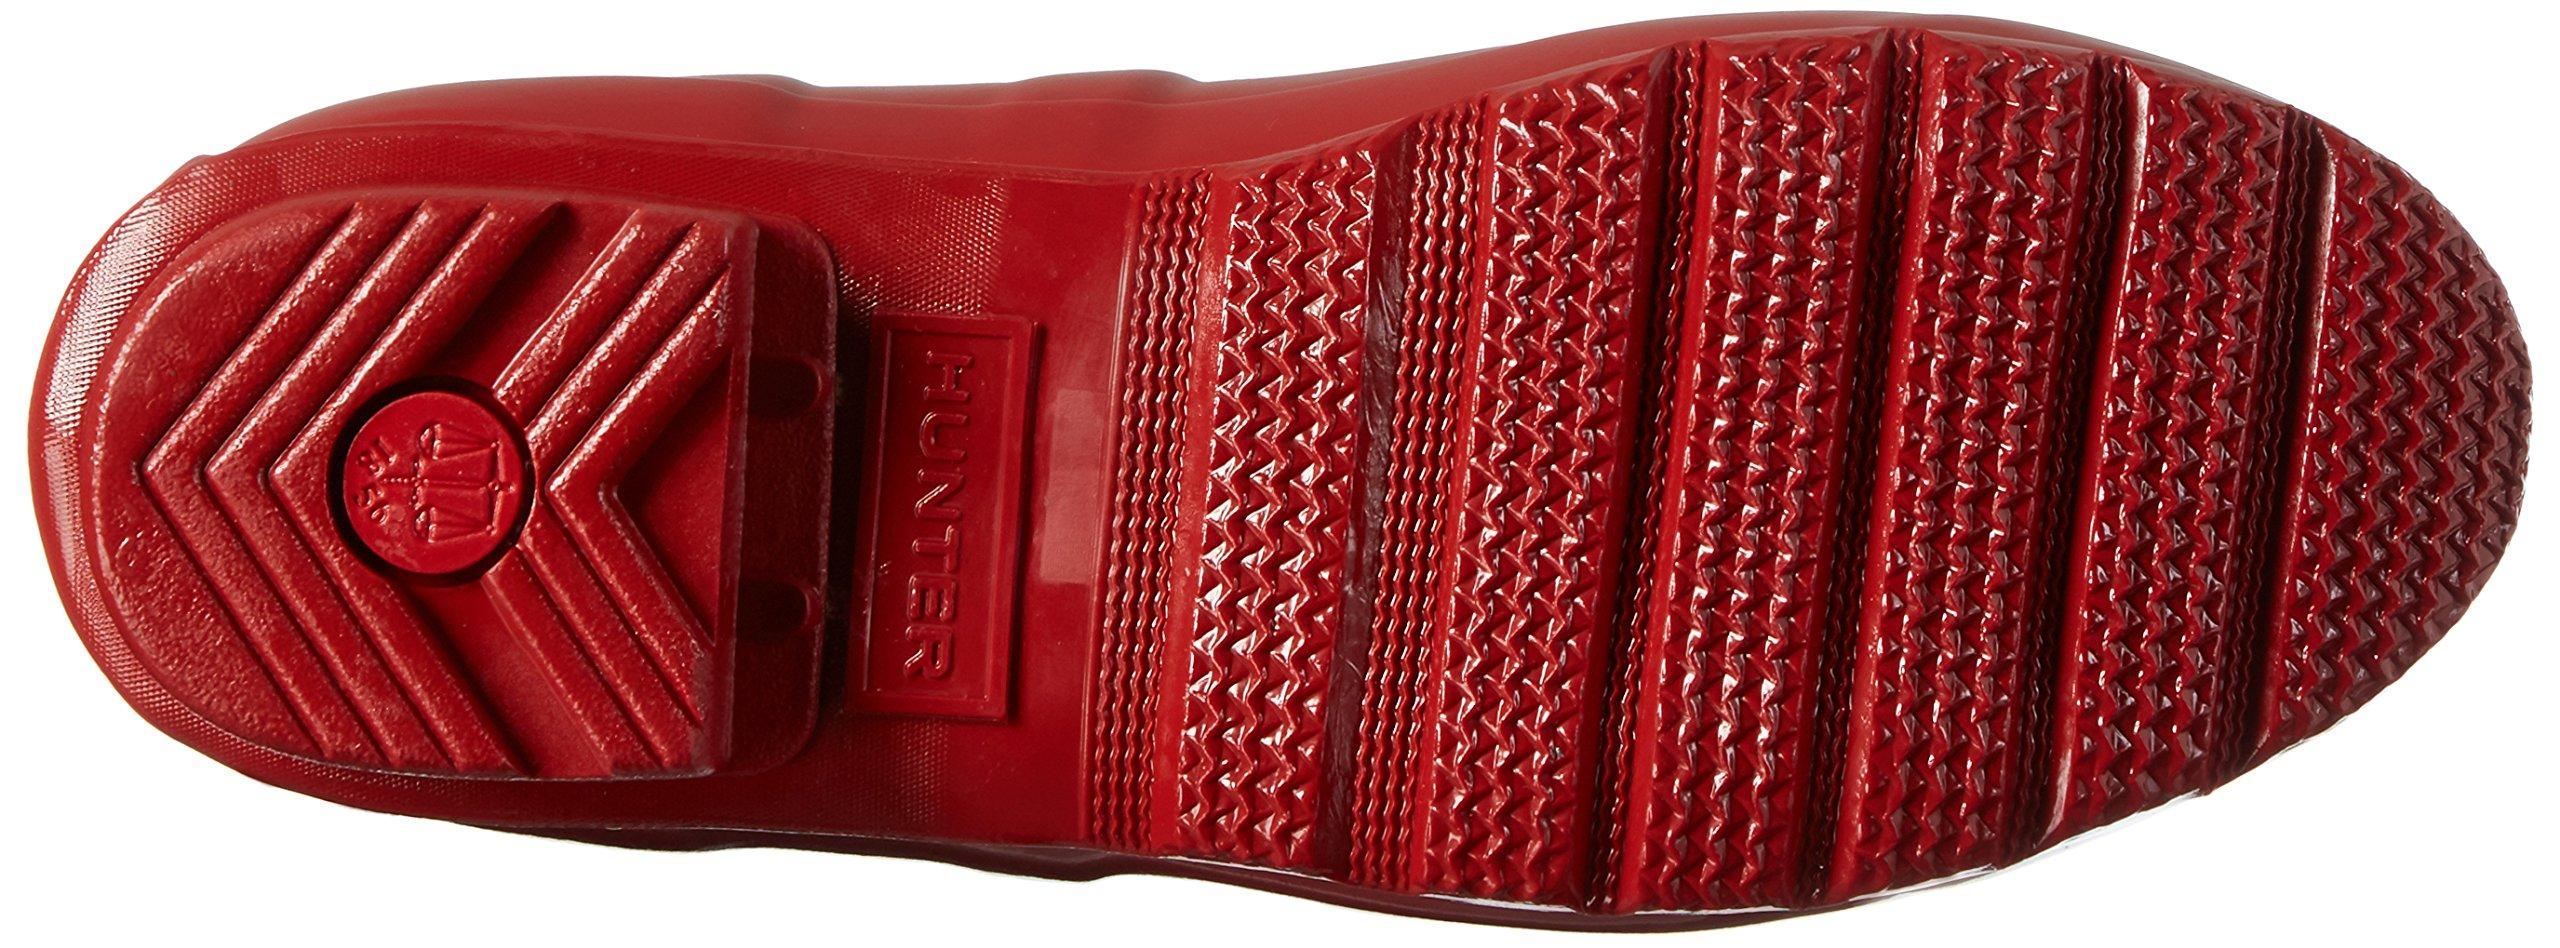 Hunter-WFS1000RGL-Women-039-s-Original-Short-Gloss-Boots-All-Colors thumbnail 30